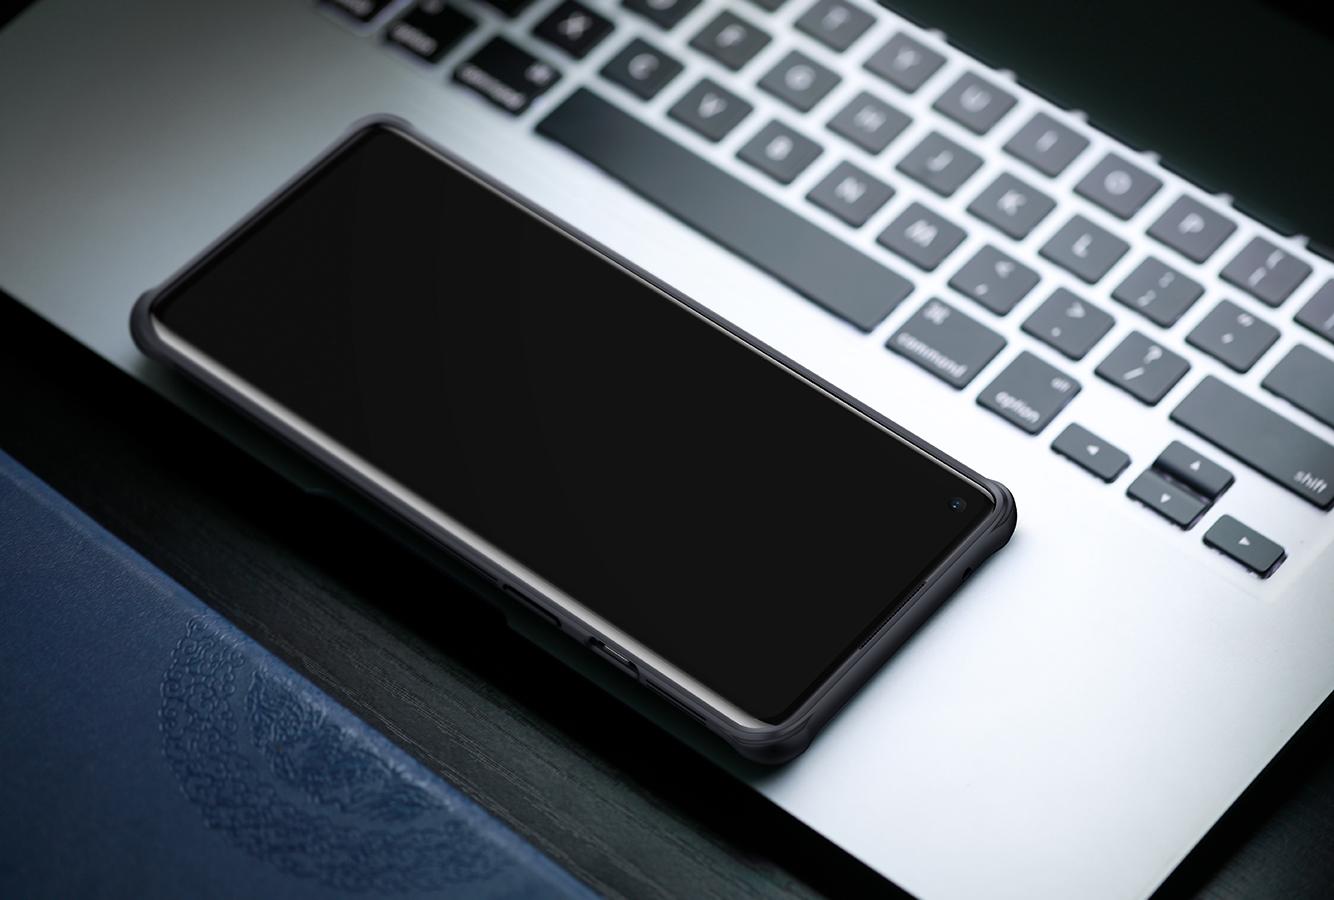 OnePlus_8_CamShield_Pro_Case-11.jpg